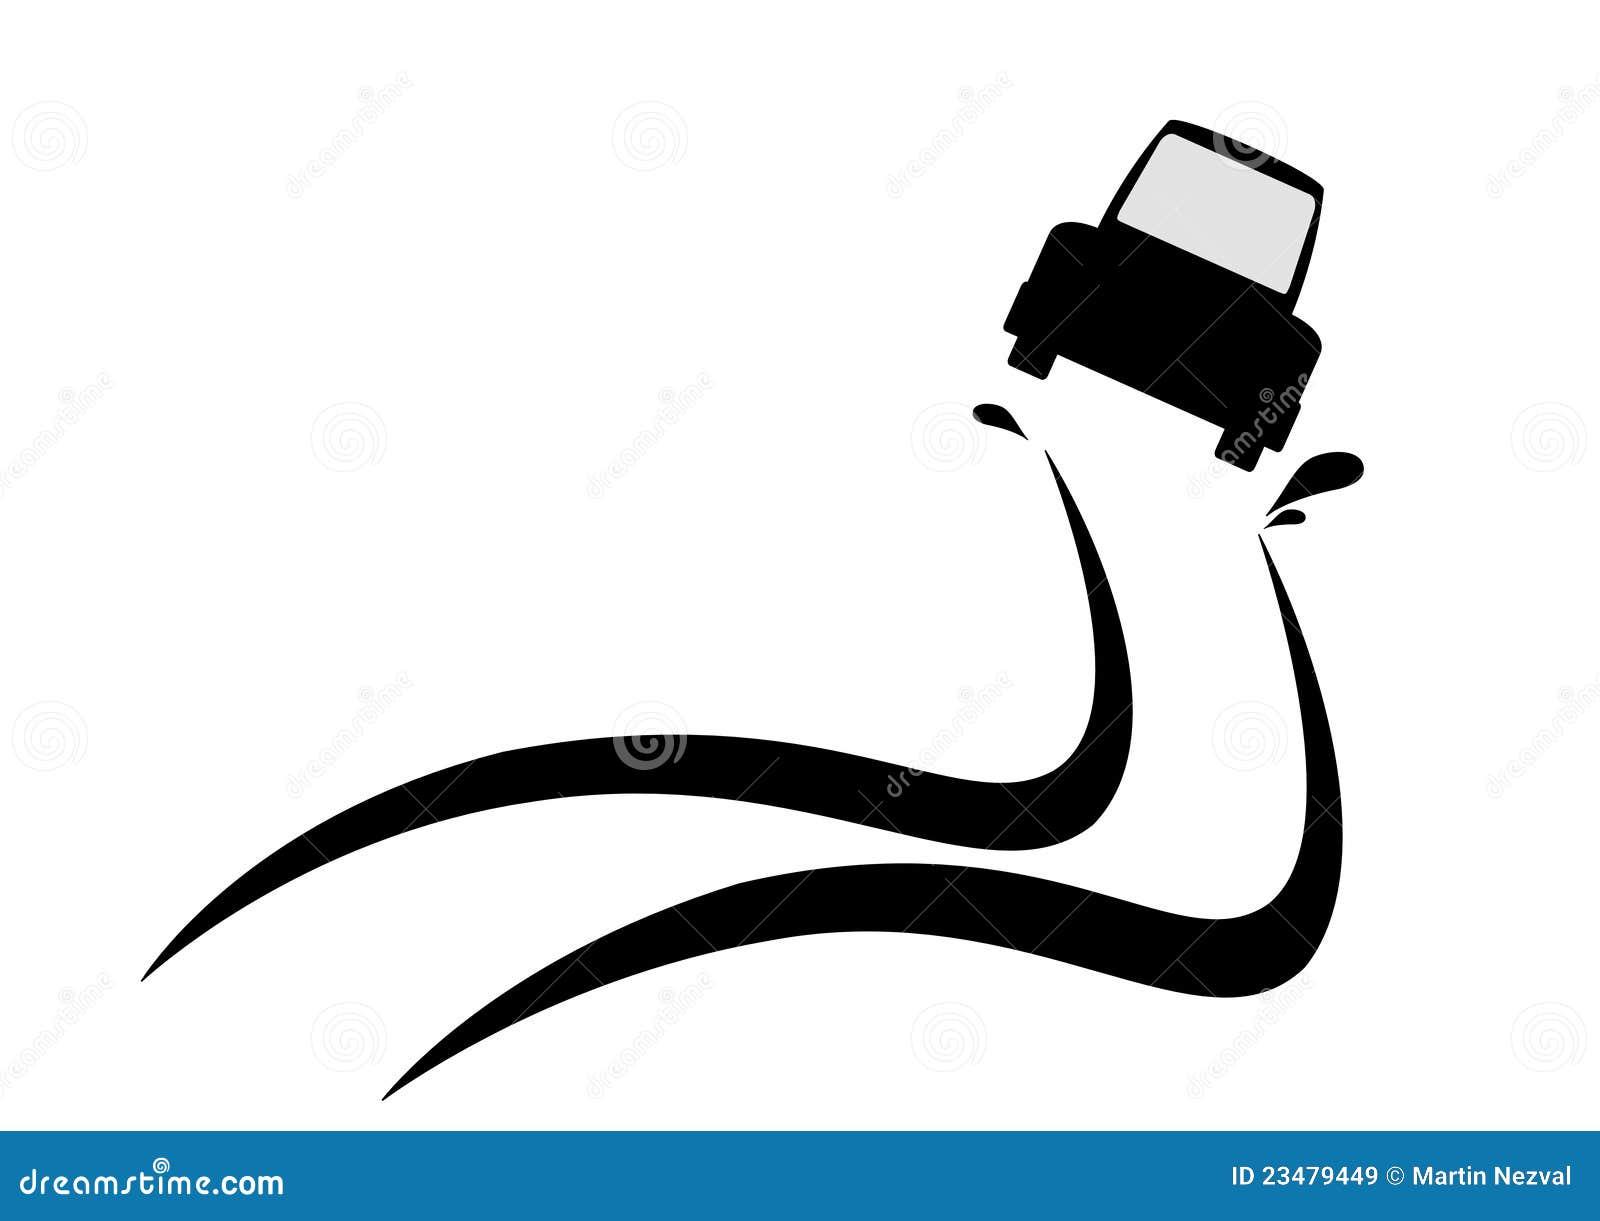 Skid Car stock illustration. Illustration of race, skidding - 23479449